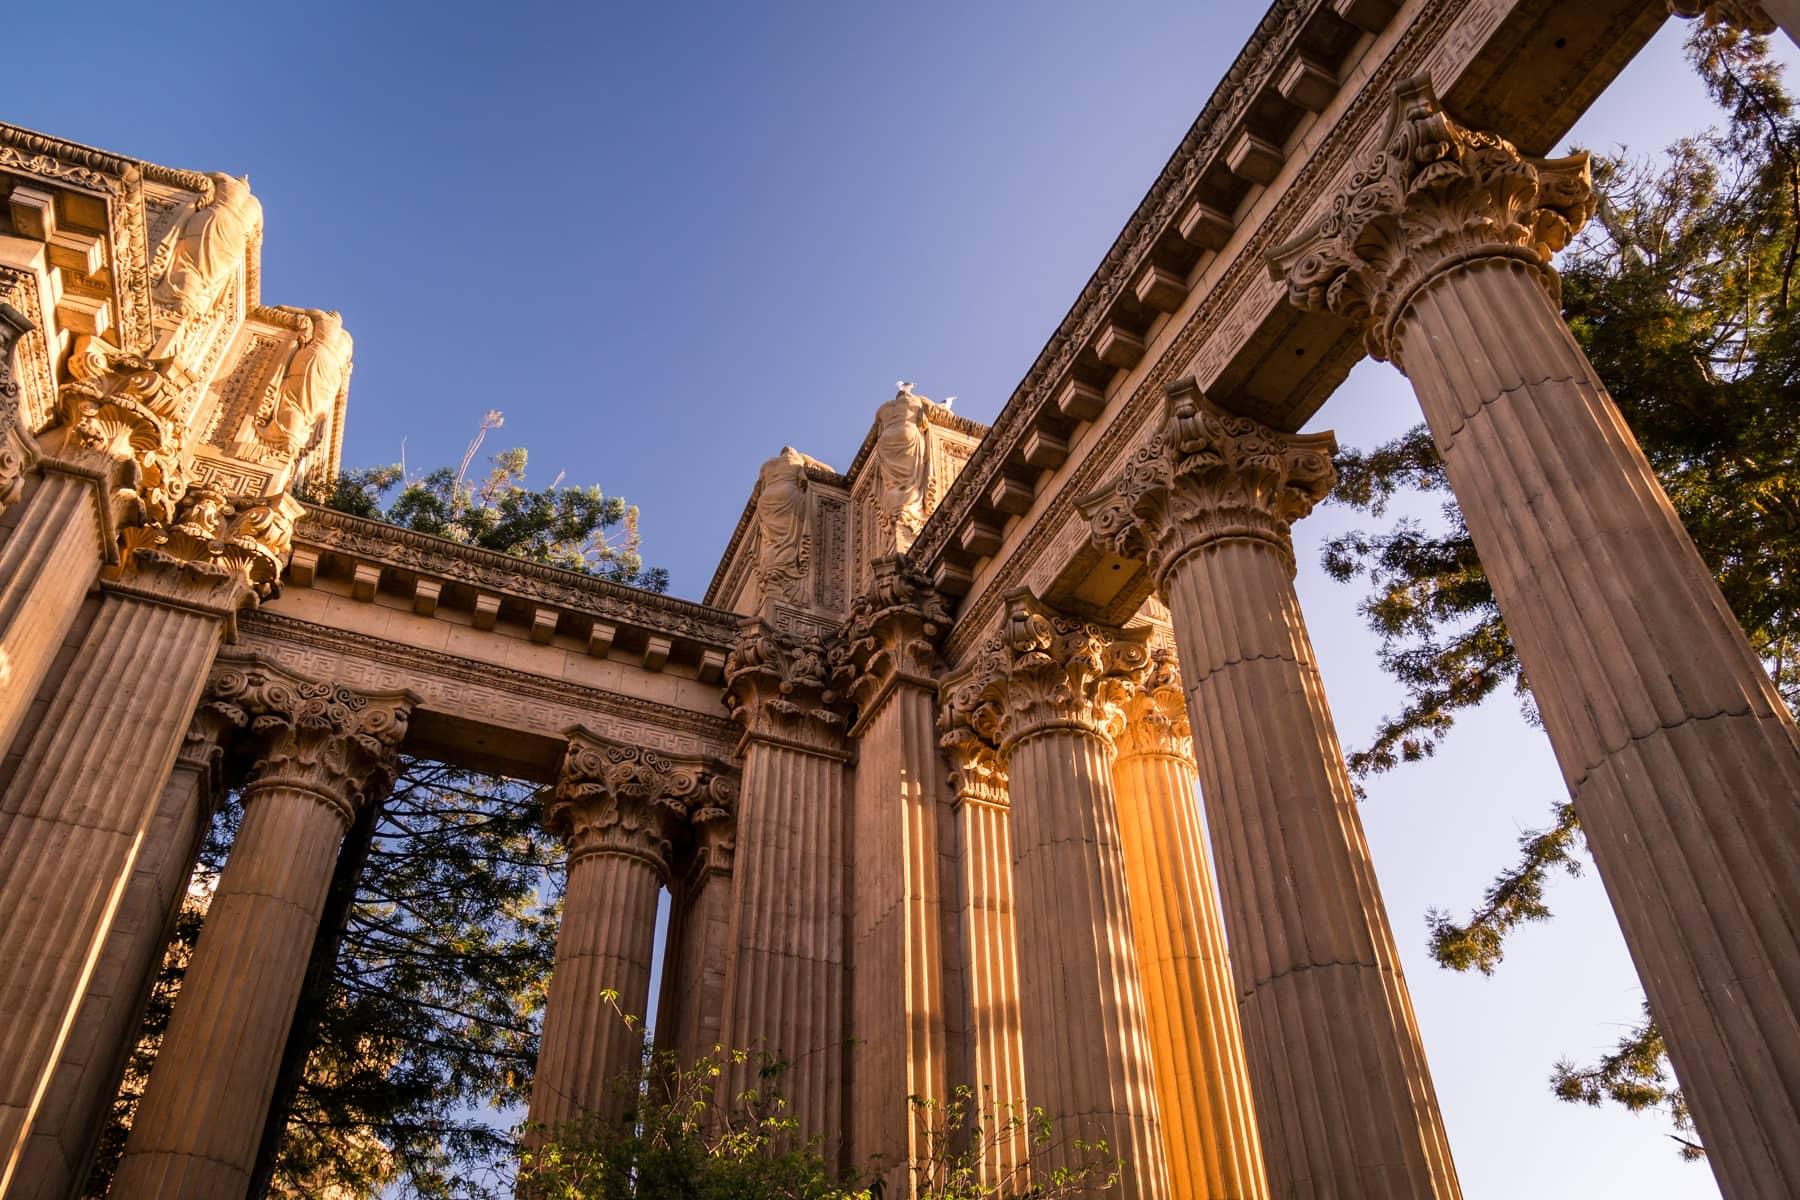 The morning sun illuminates columns at San Francisco's Palace of Fine Arts.